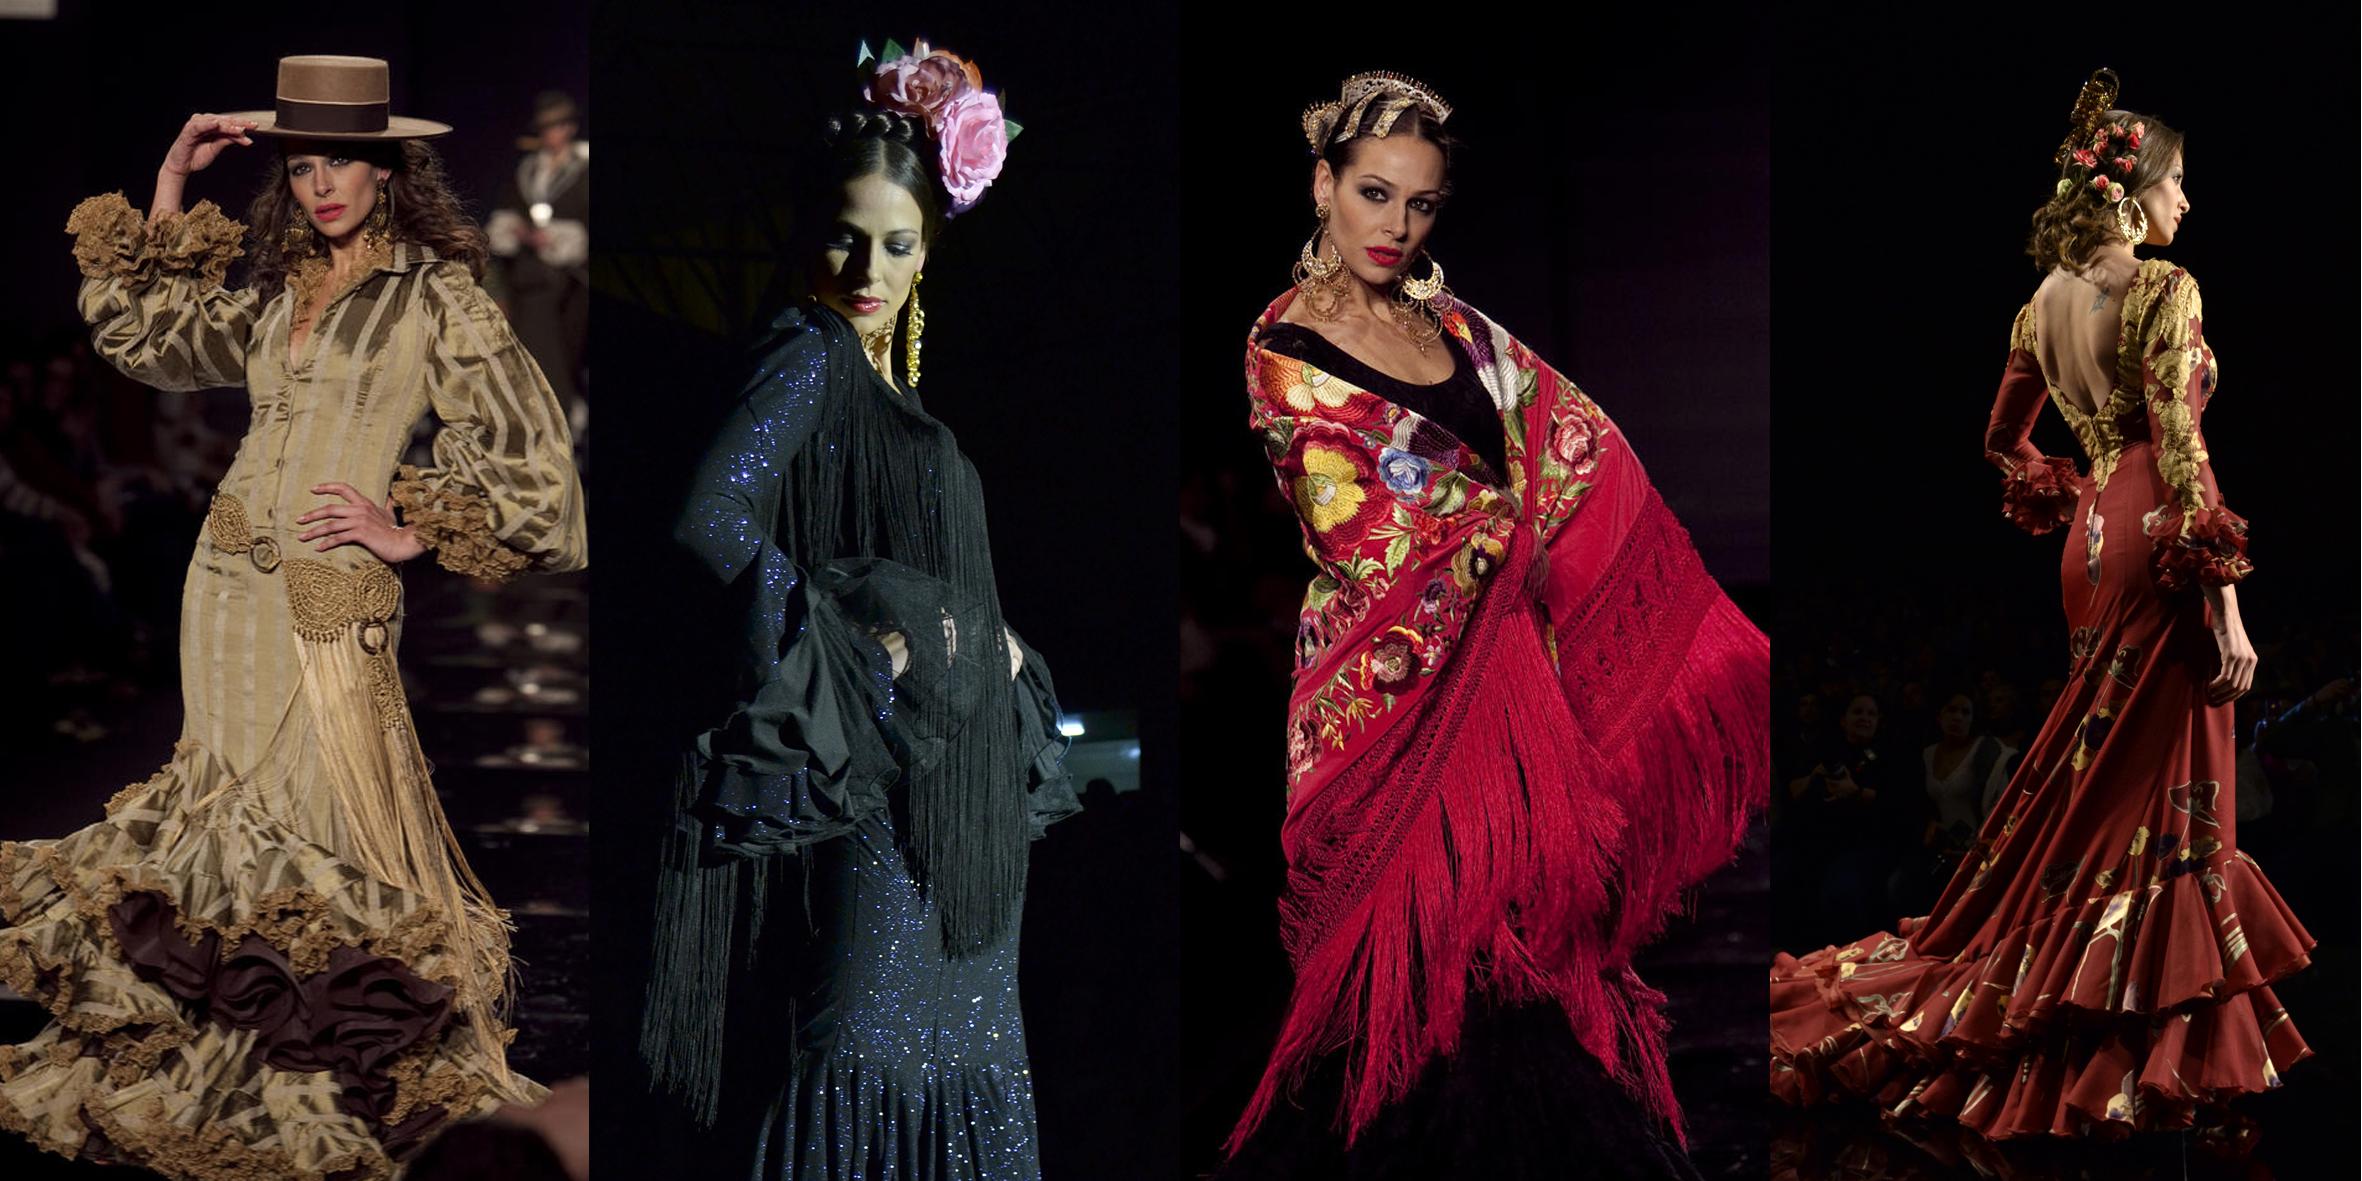 Eva González, de musa flamenca a novia del año